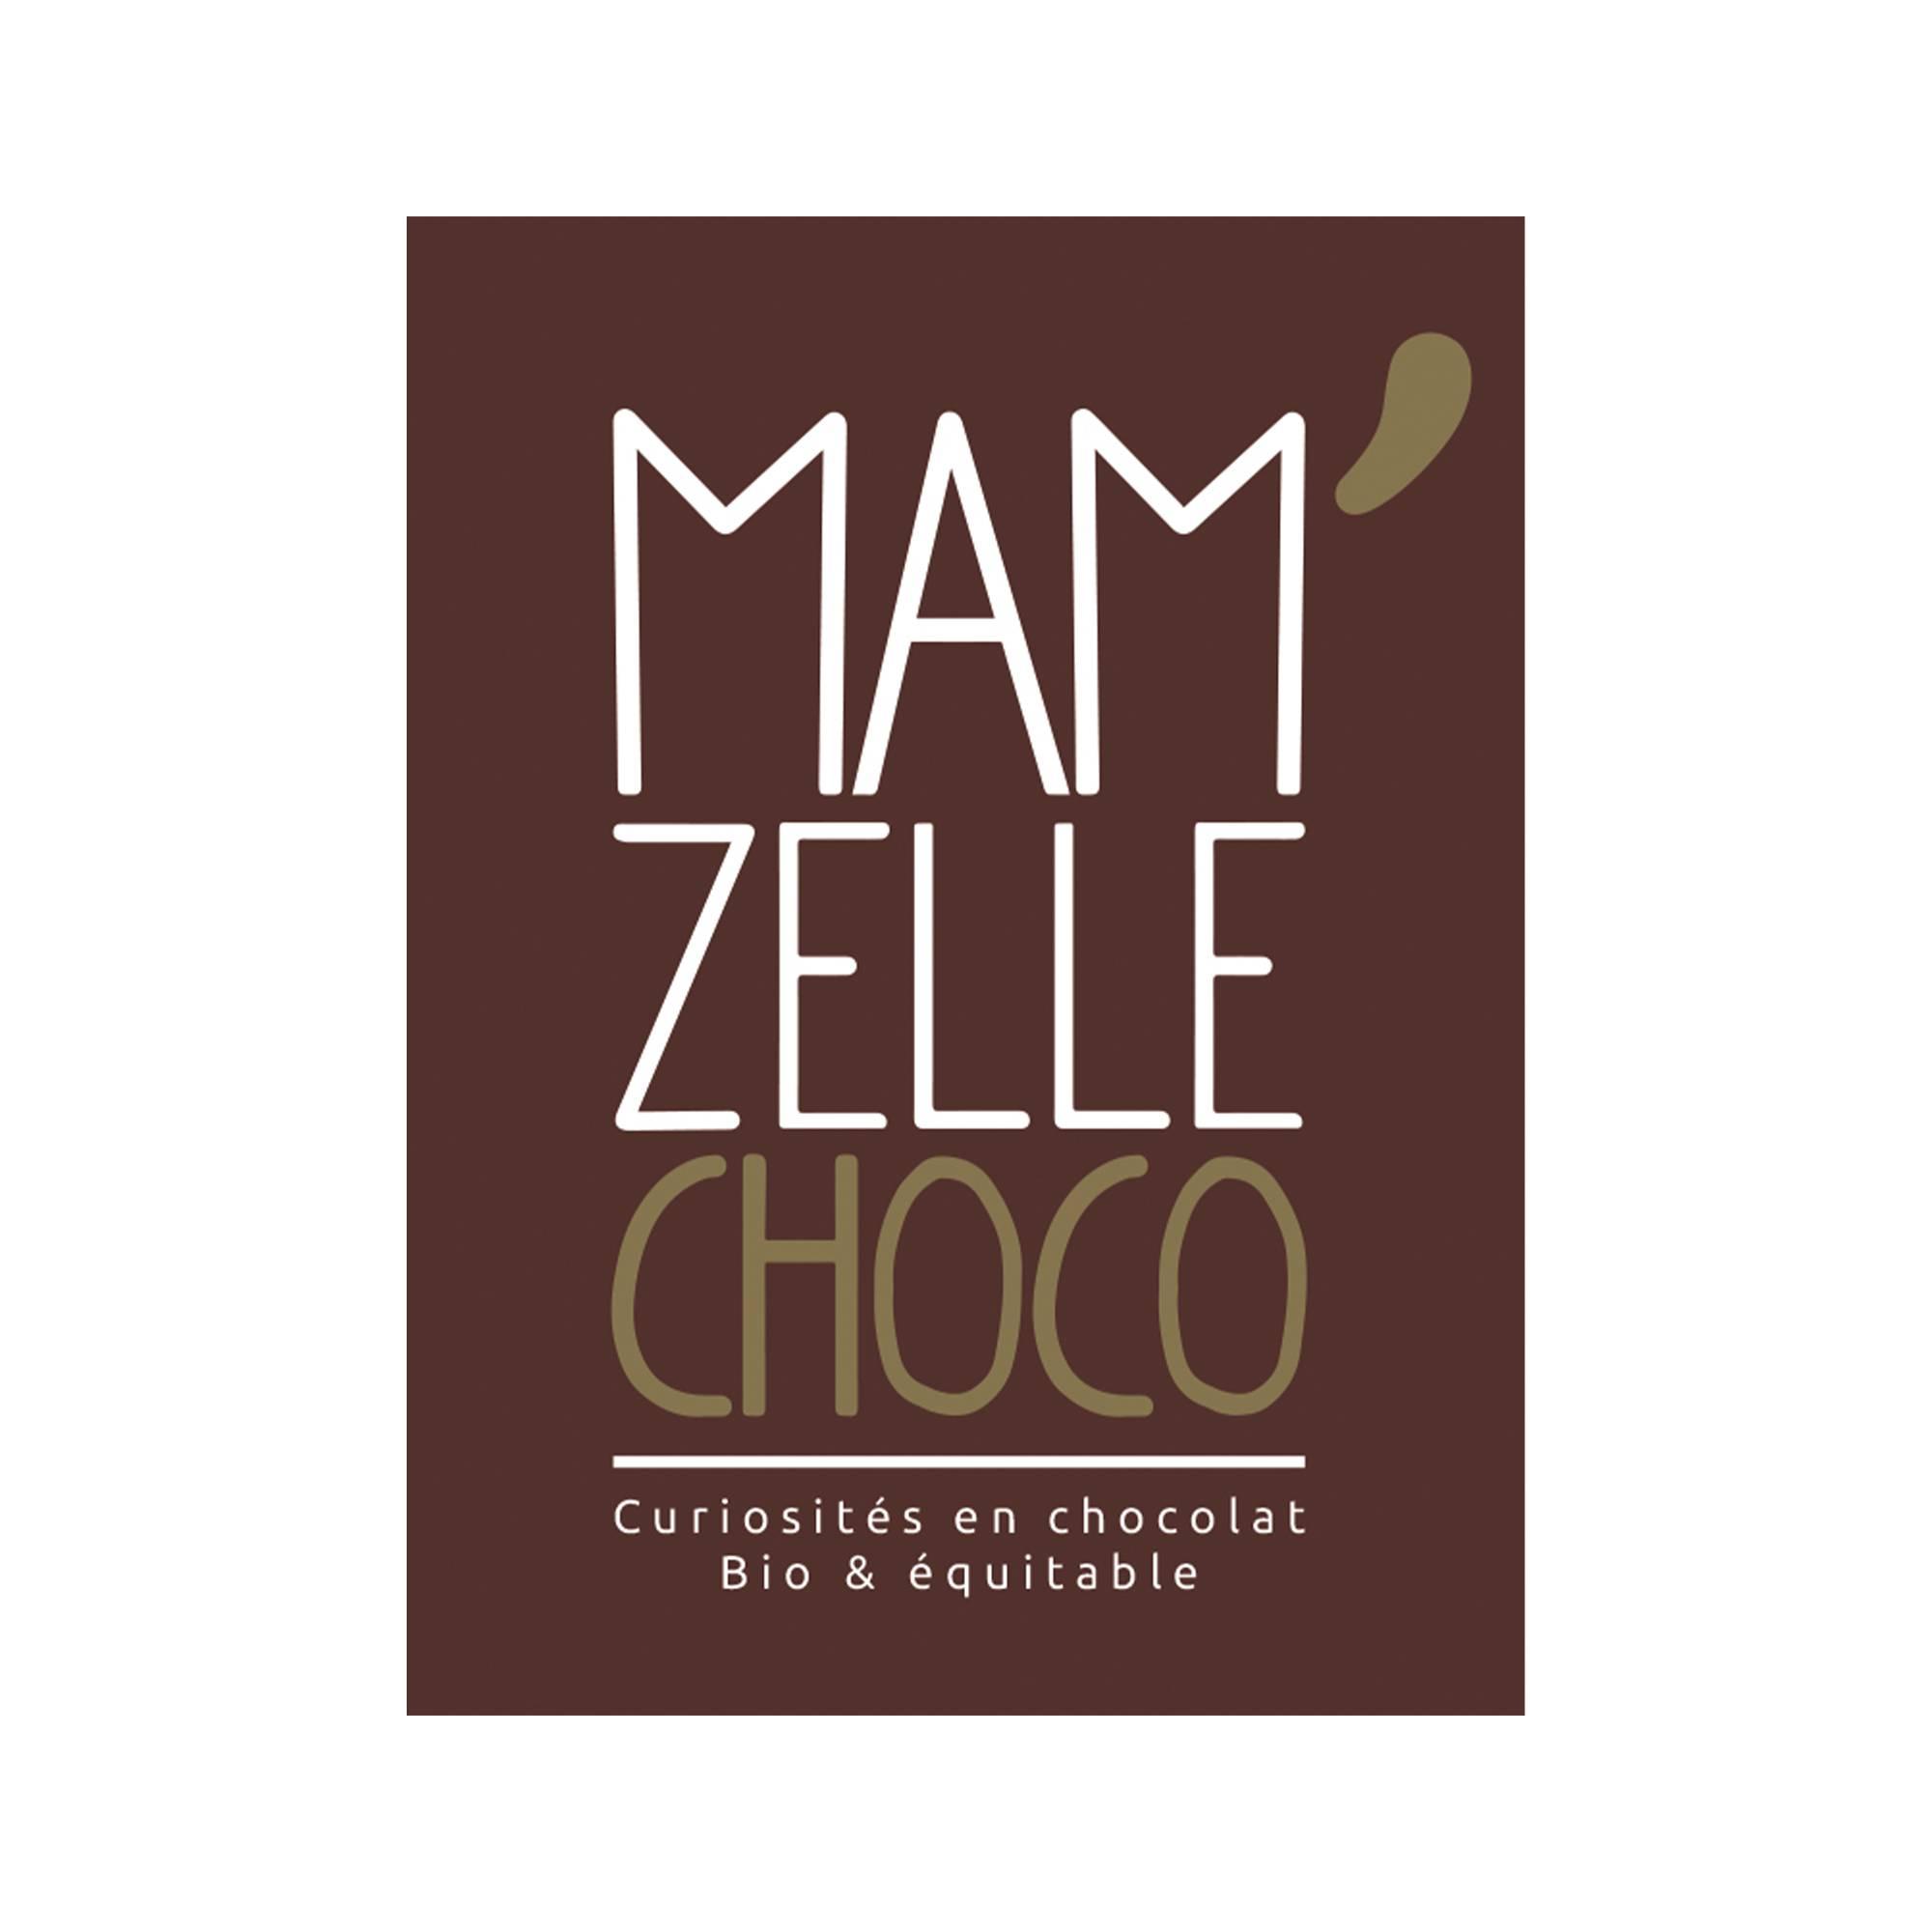 logo-Mam_Zelle-Choco